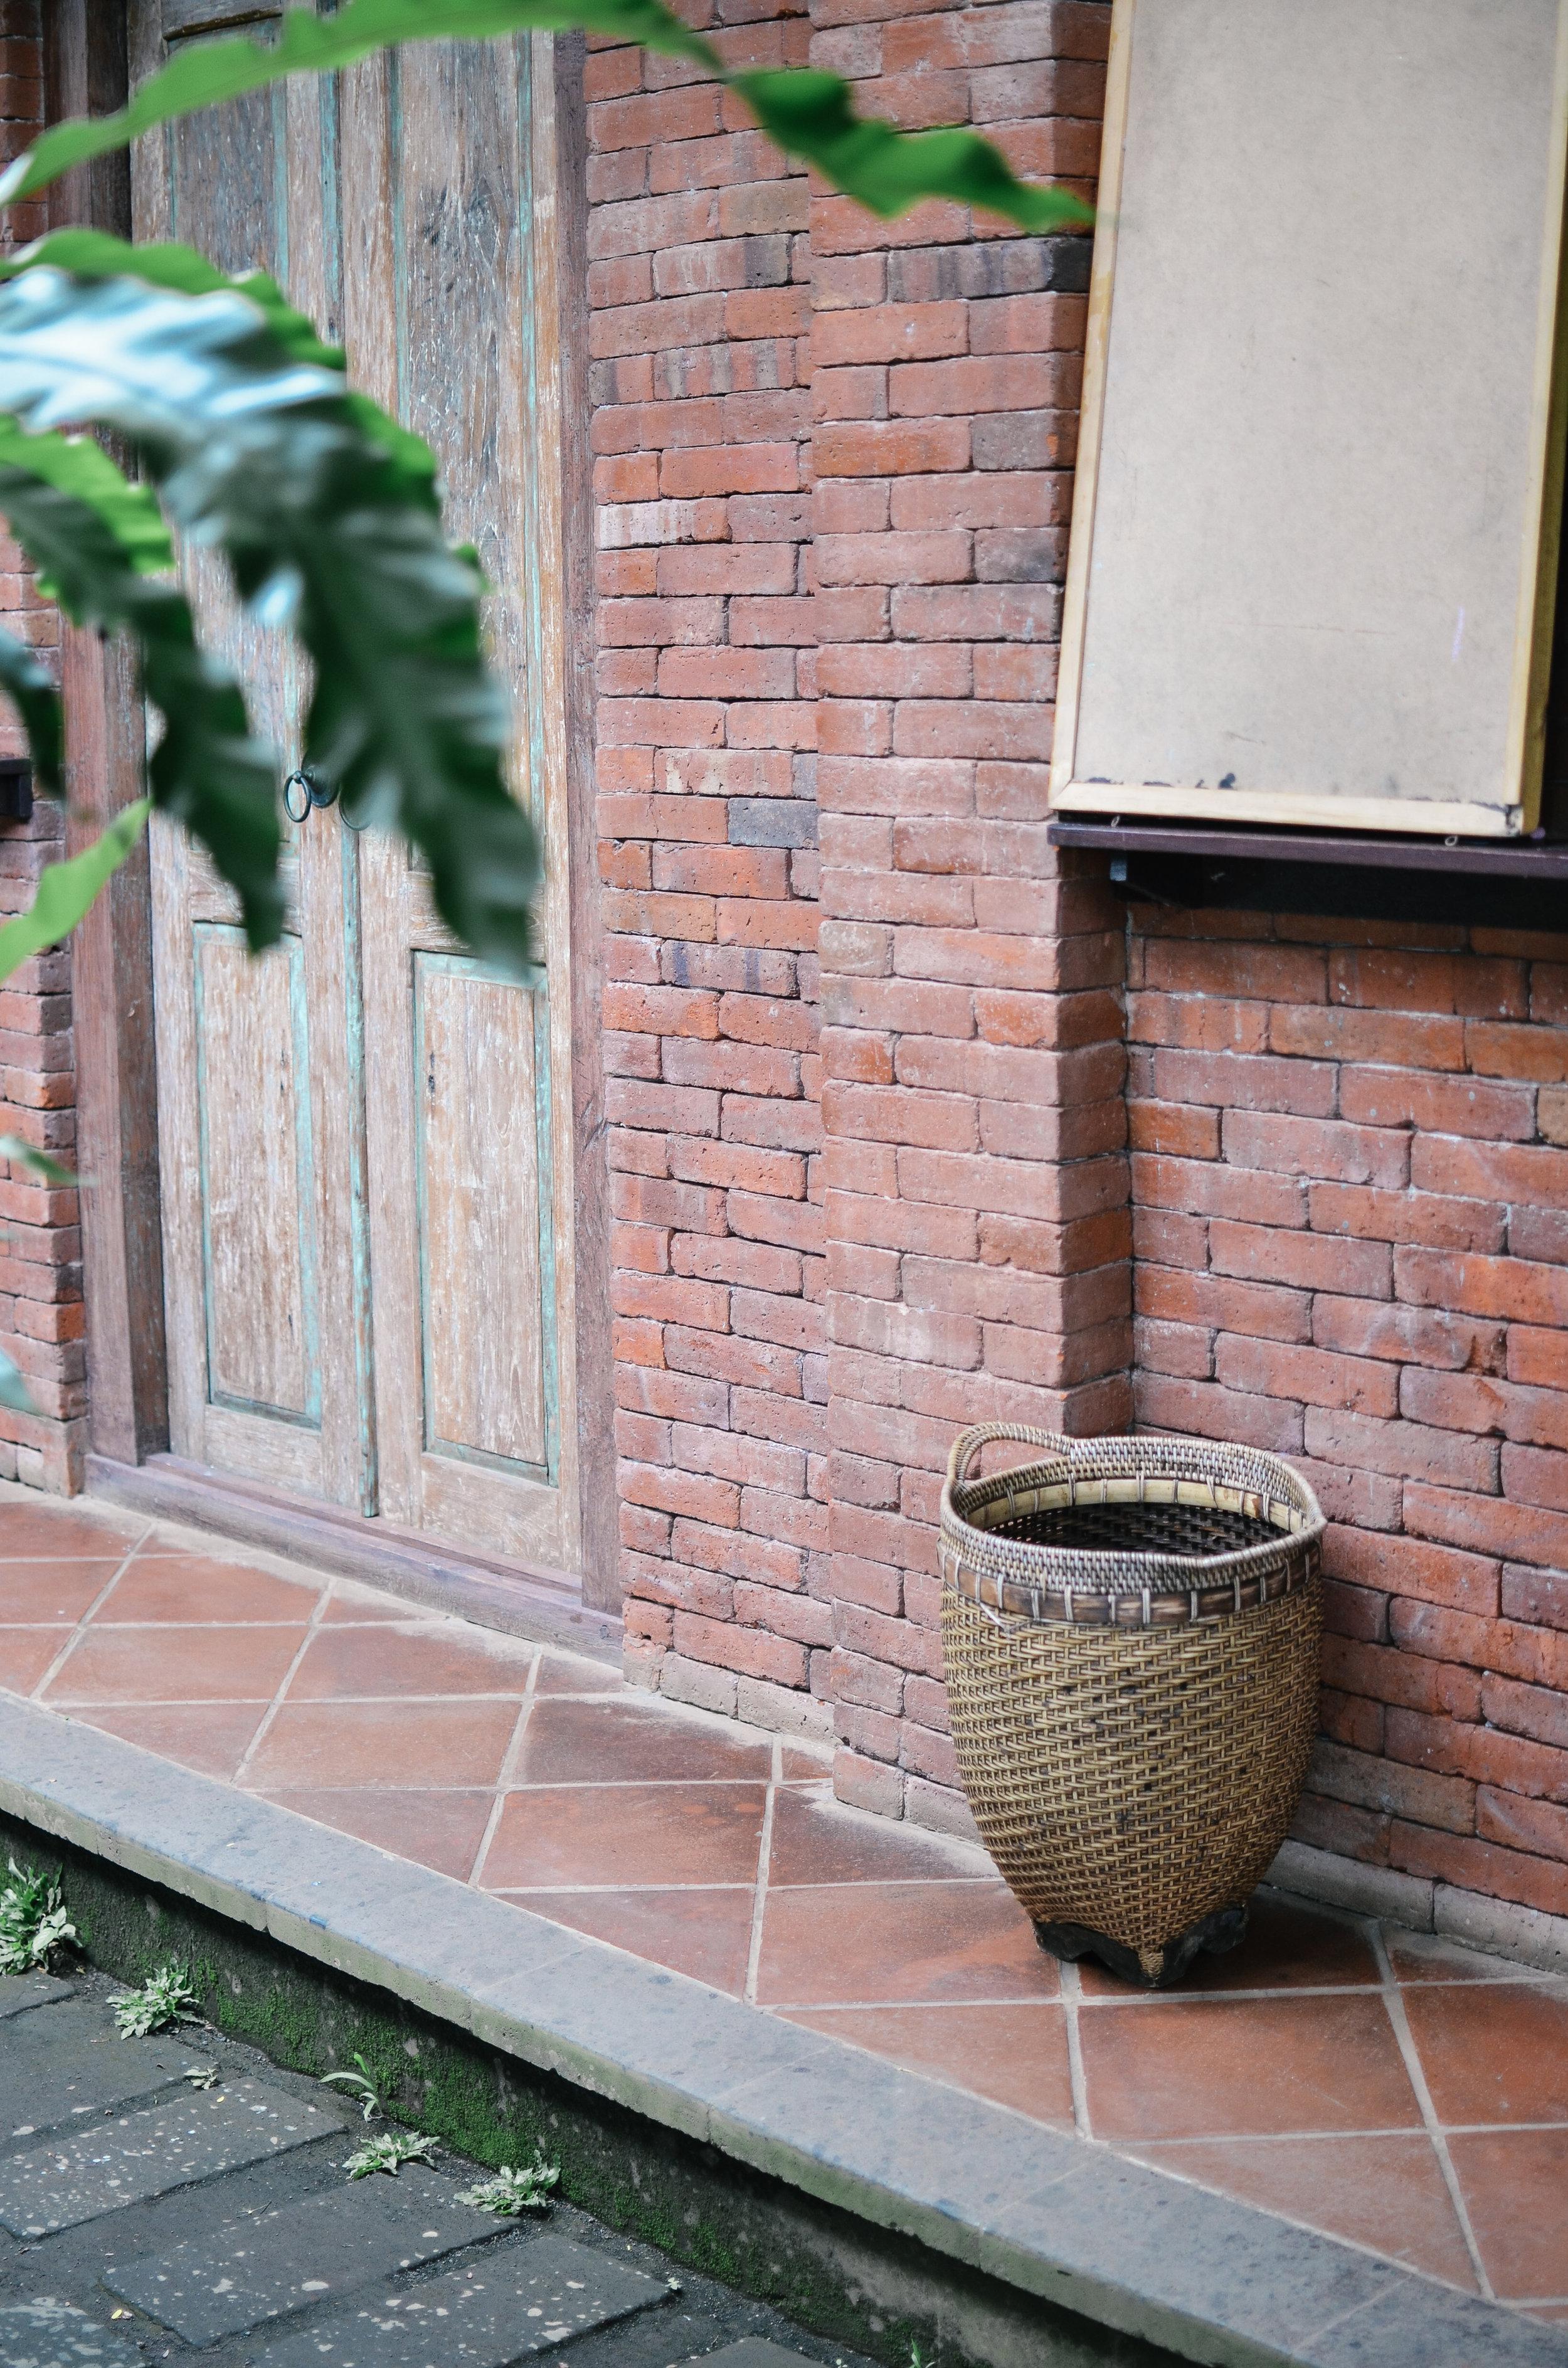 bali+mosca+bamboo+lodge+bali+ubud+lifeonpine_DSC_2748.jpg